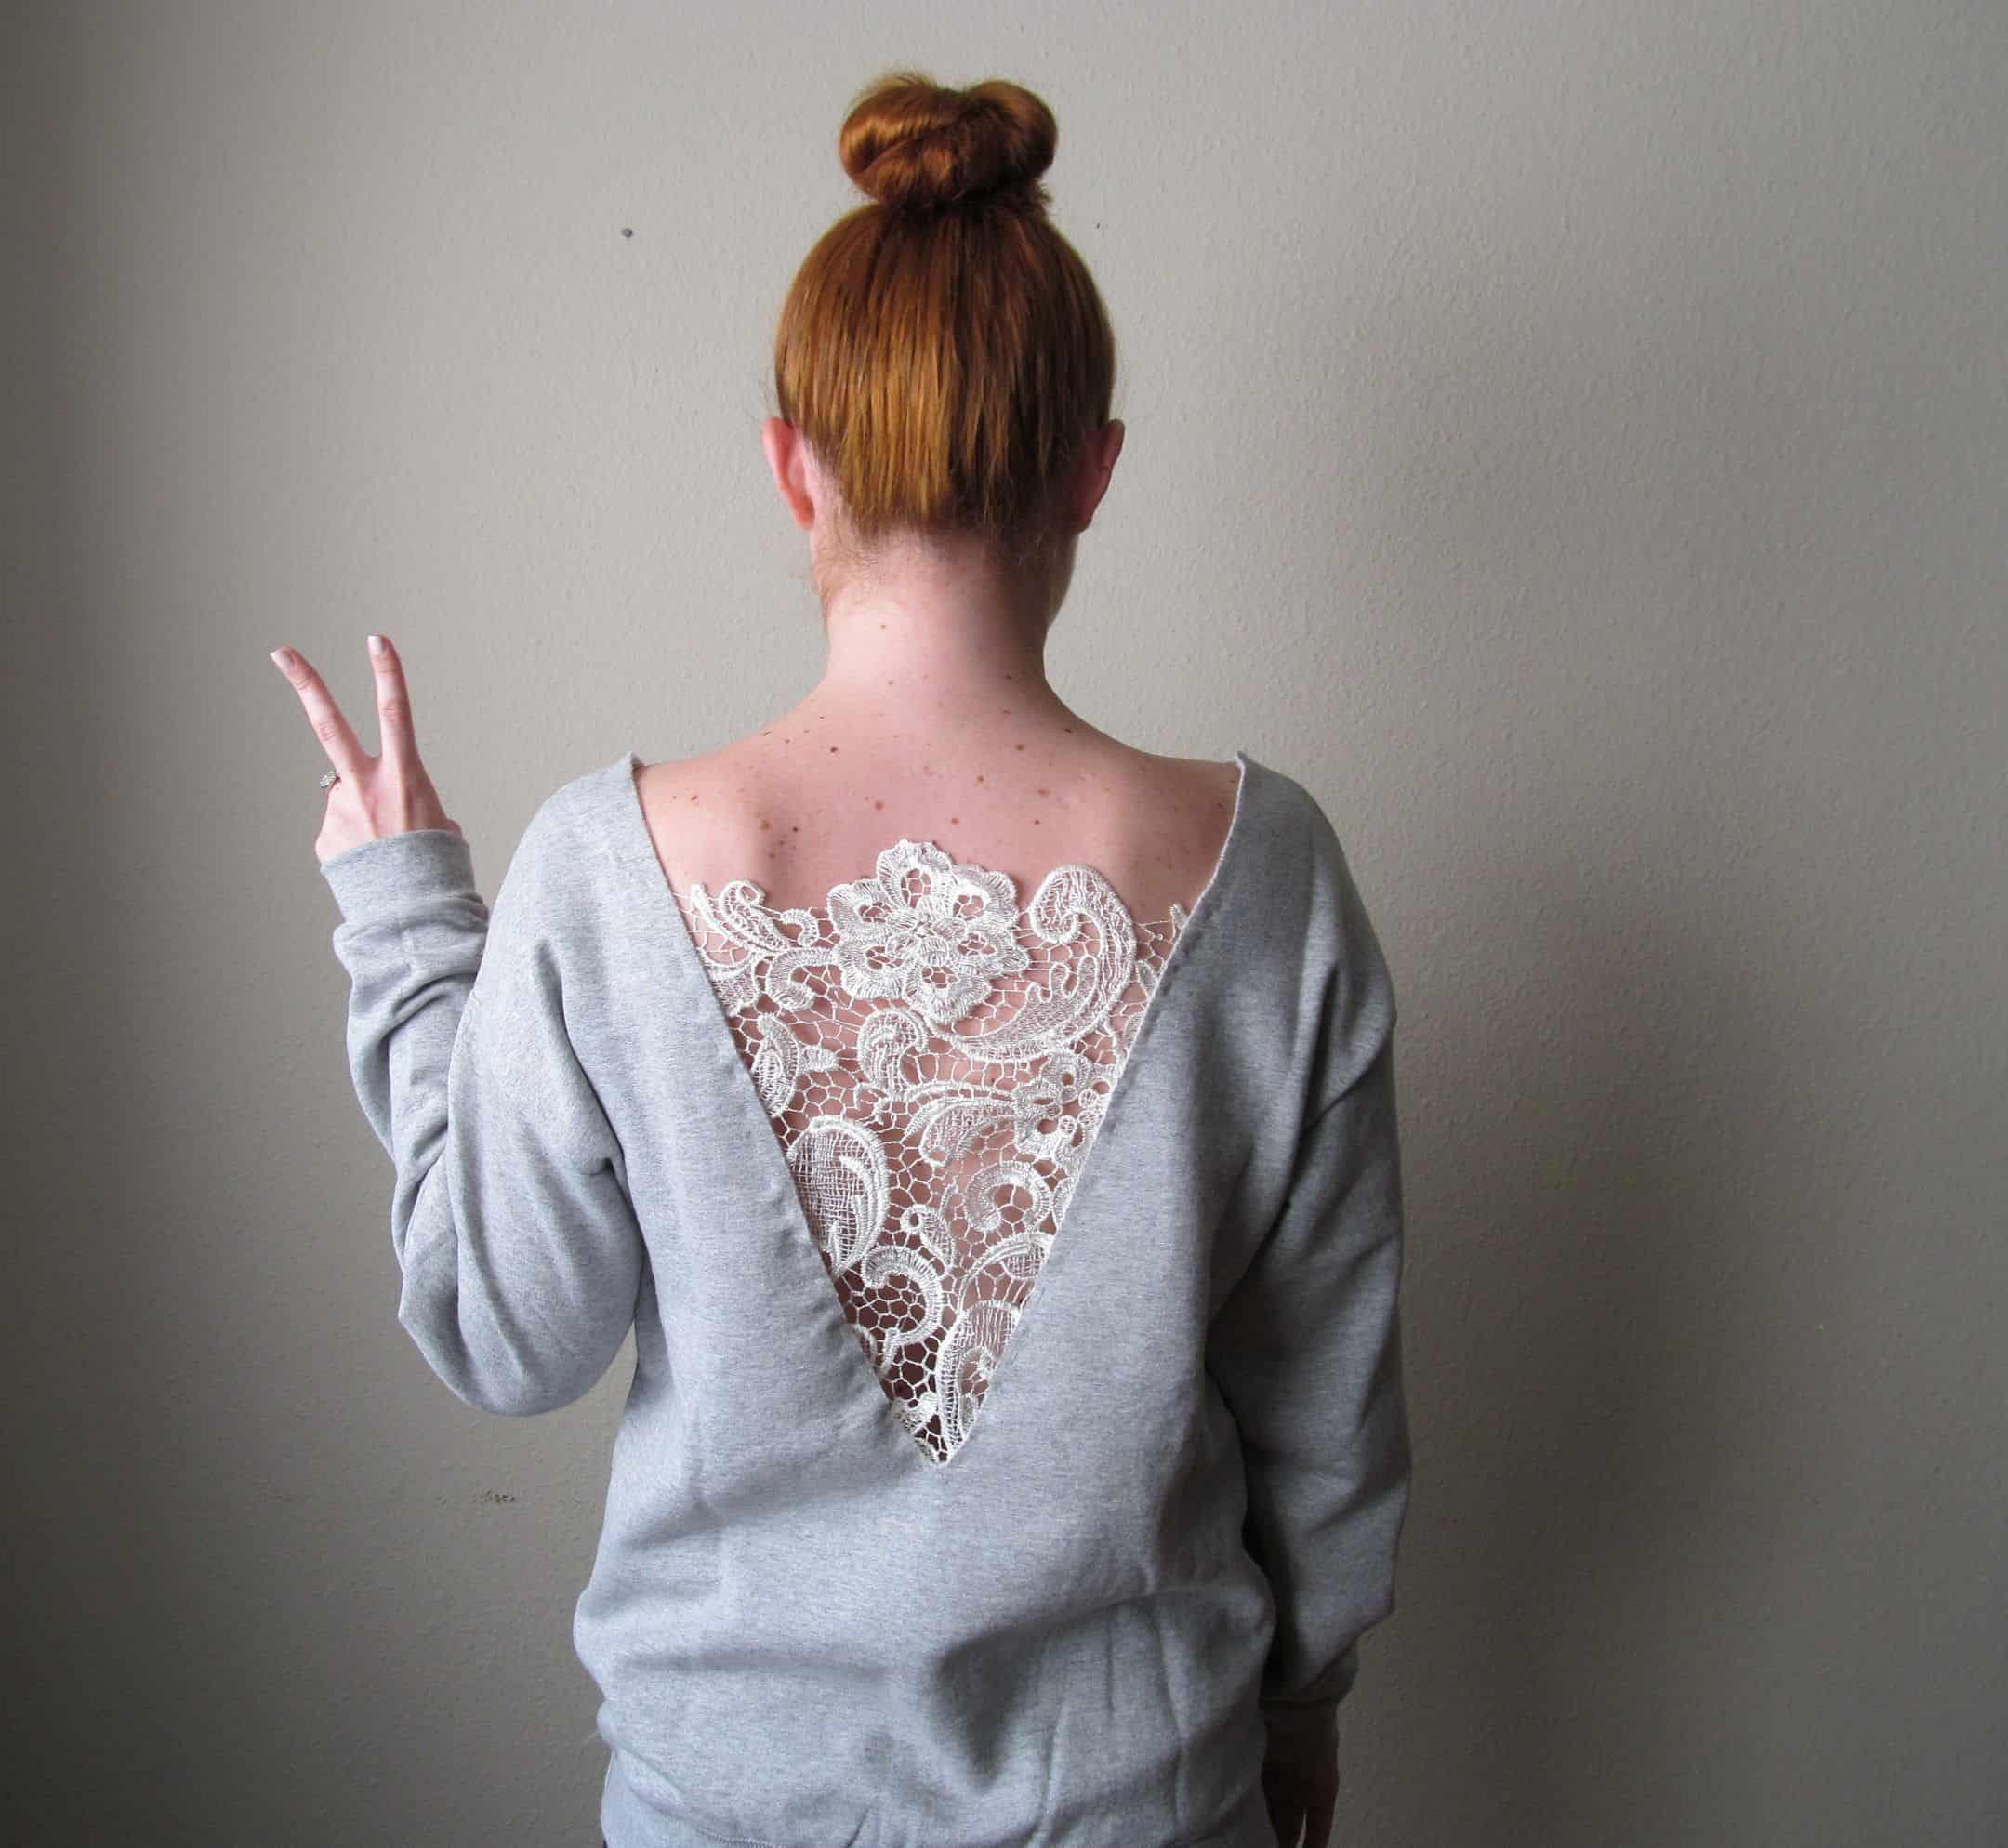 Lace cut out sweatshirt